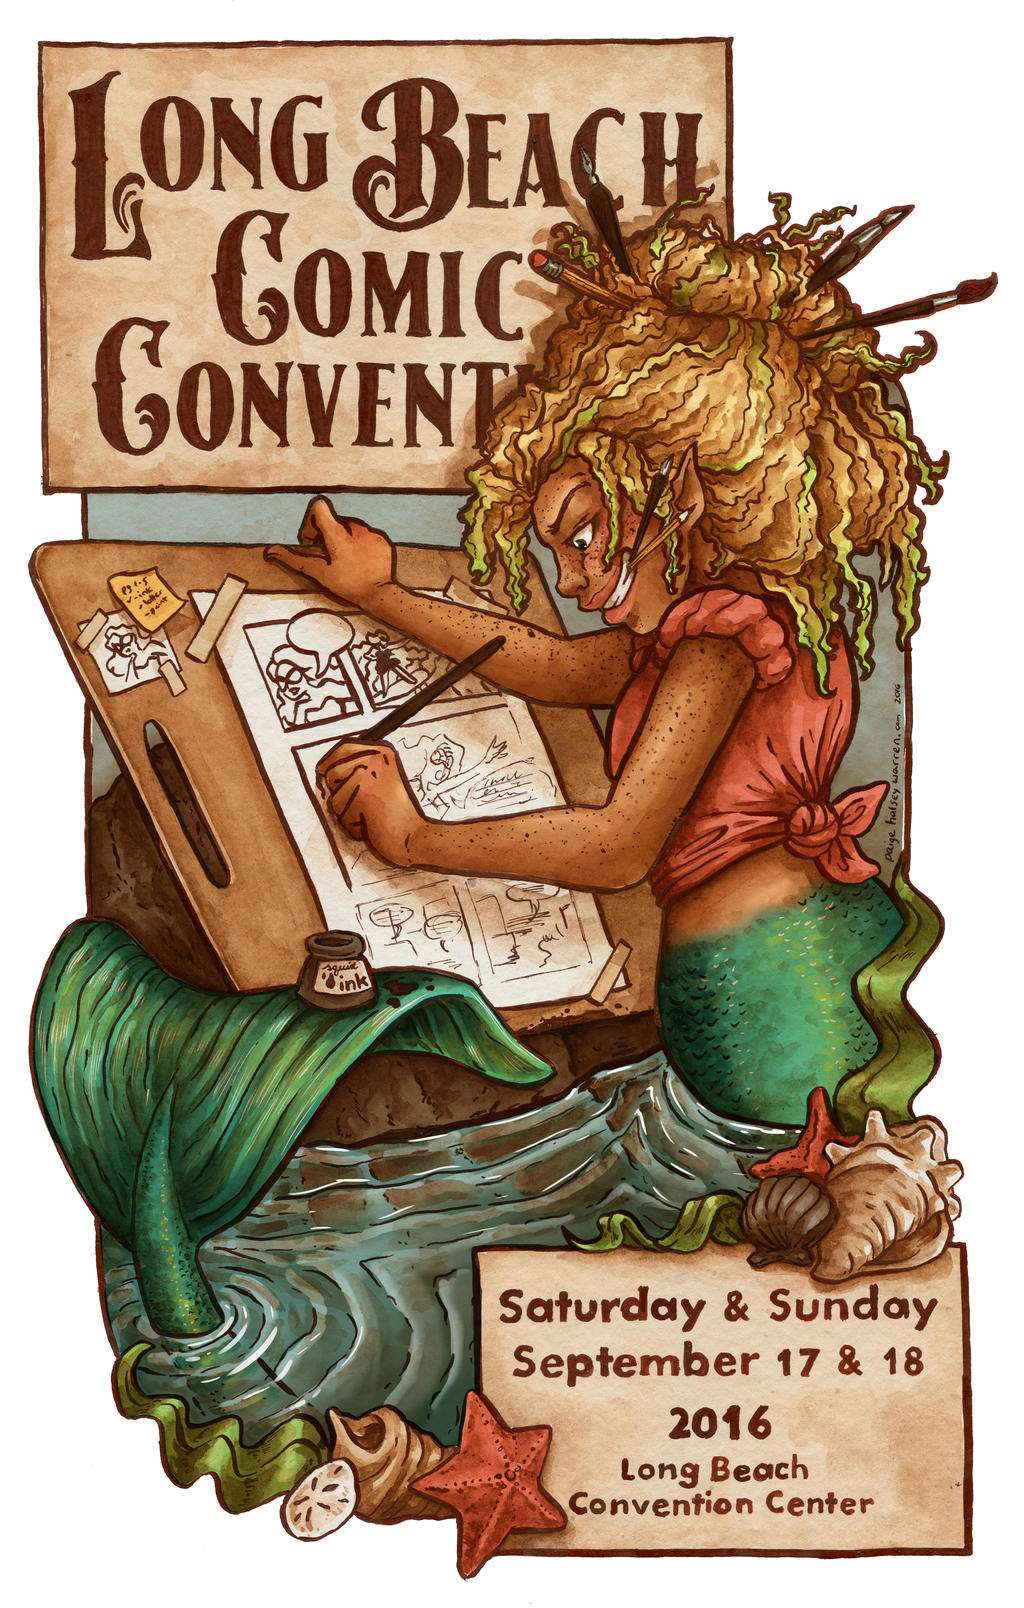 Long Beach Comic Con Poster 2016 by paigehwarren